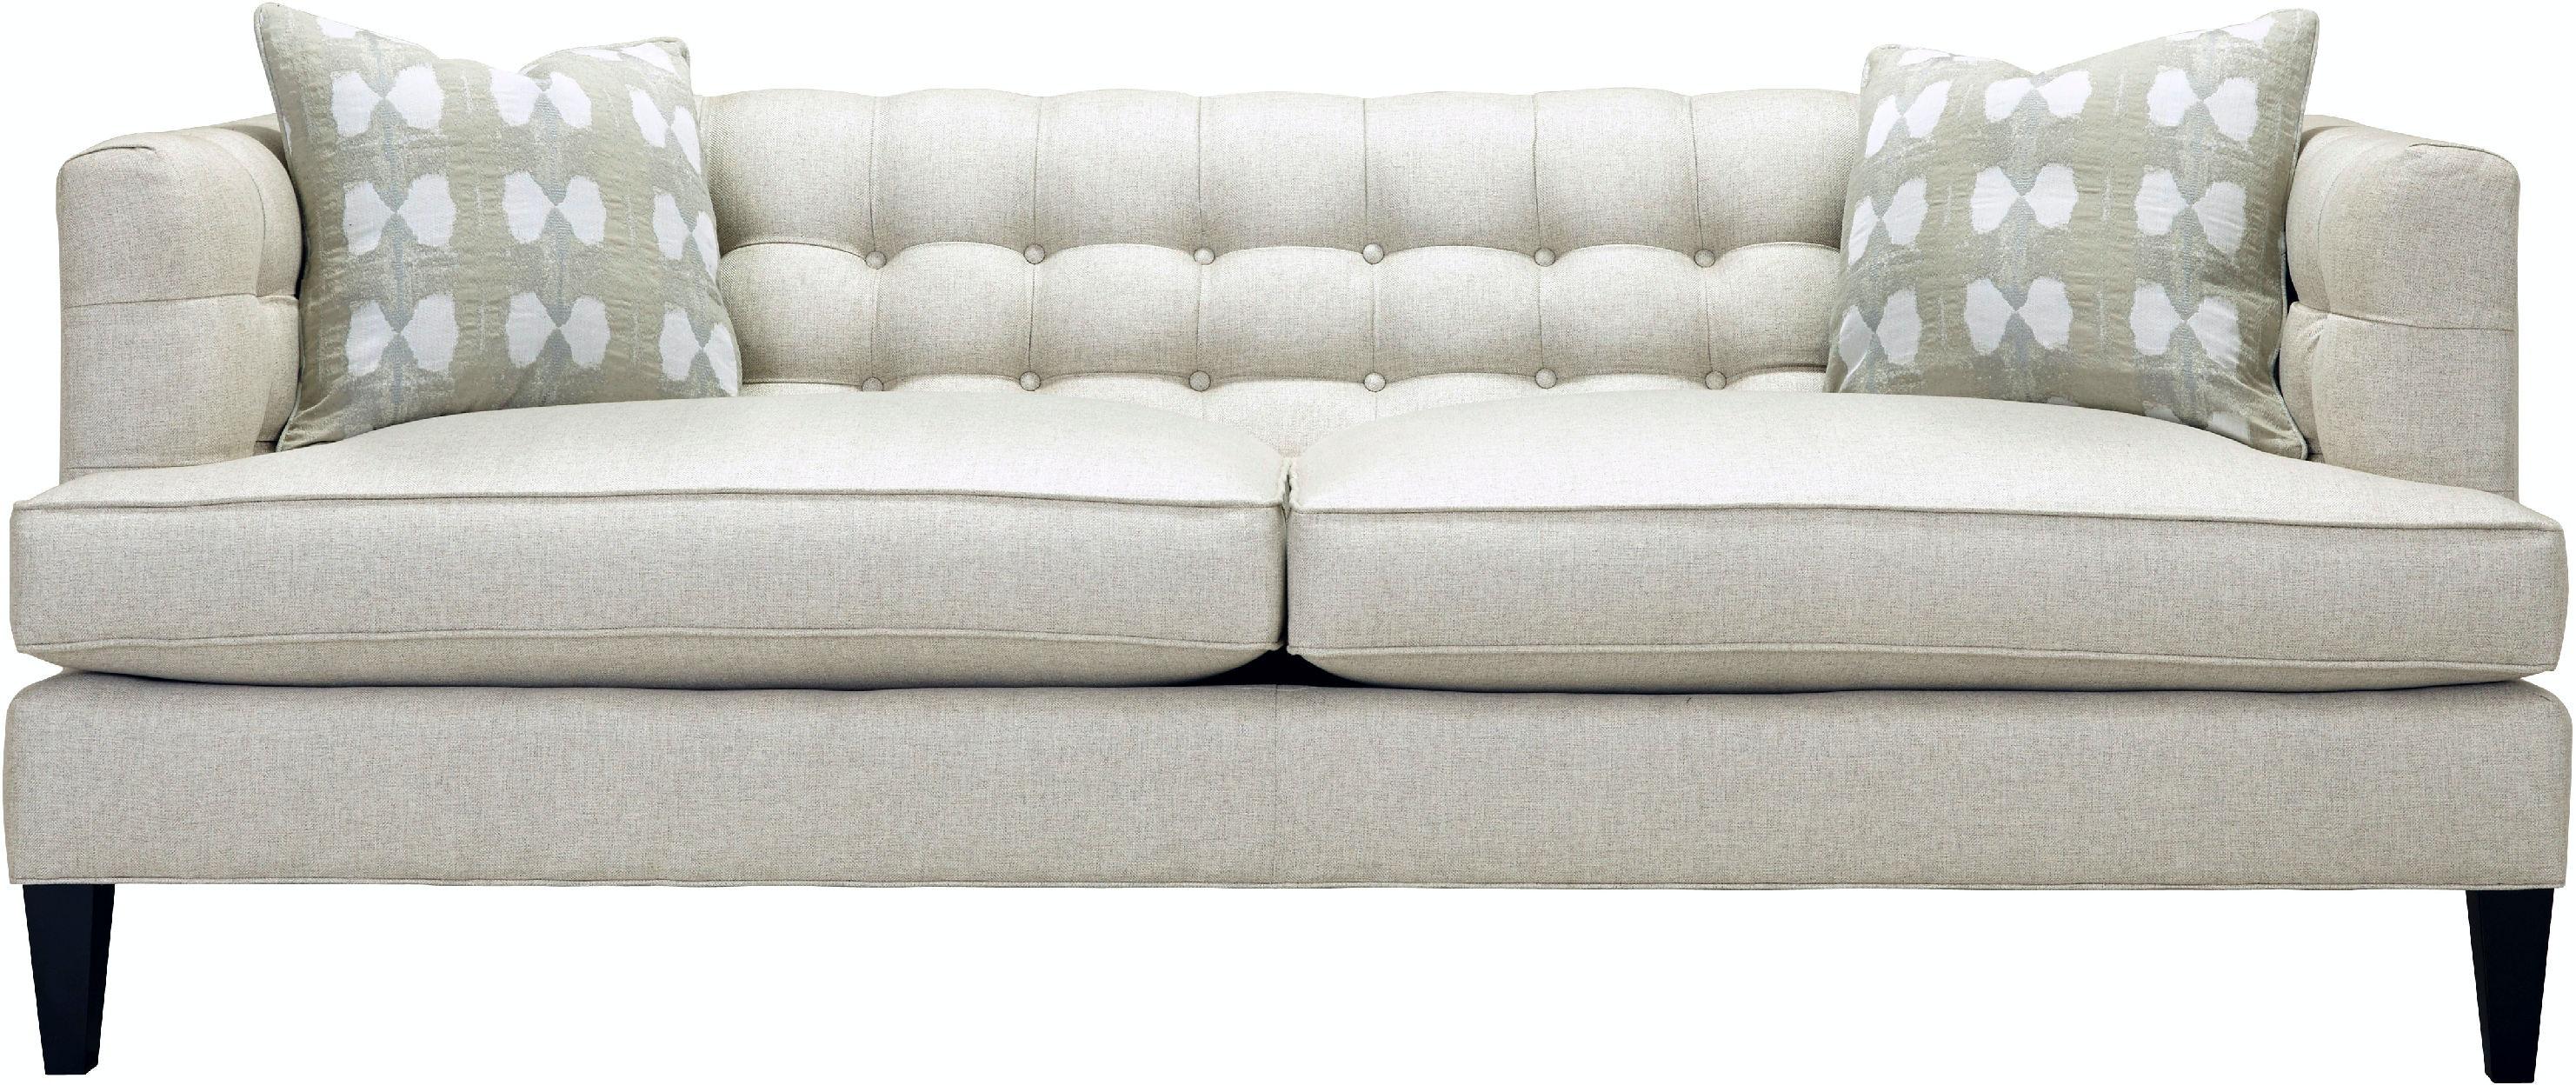 Southern Furniture Living Room Concord Sofa 21051 Gorman S Metro